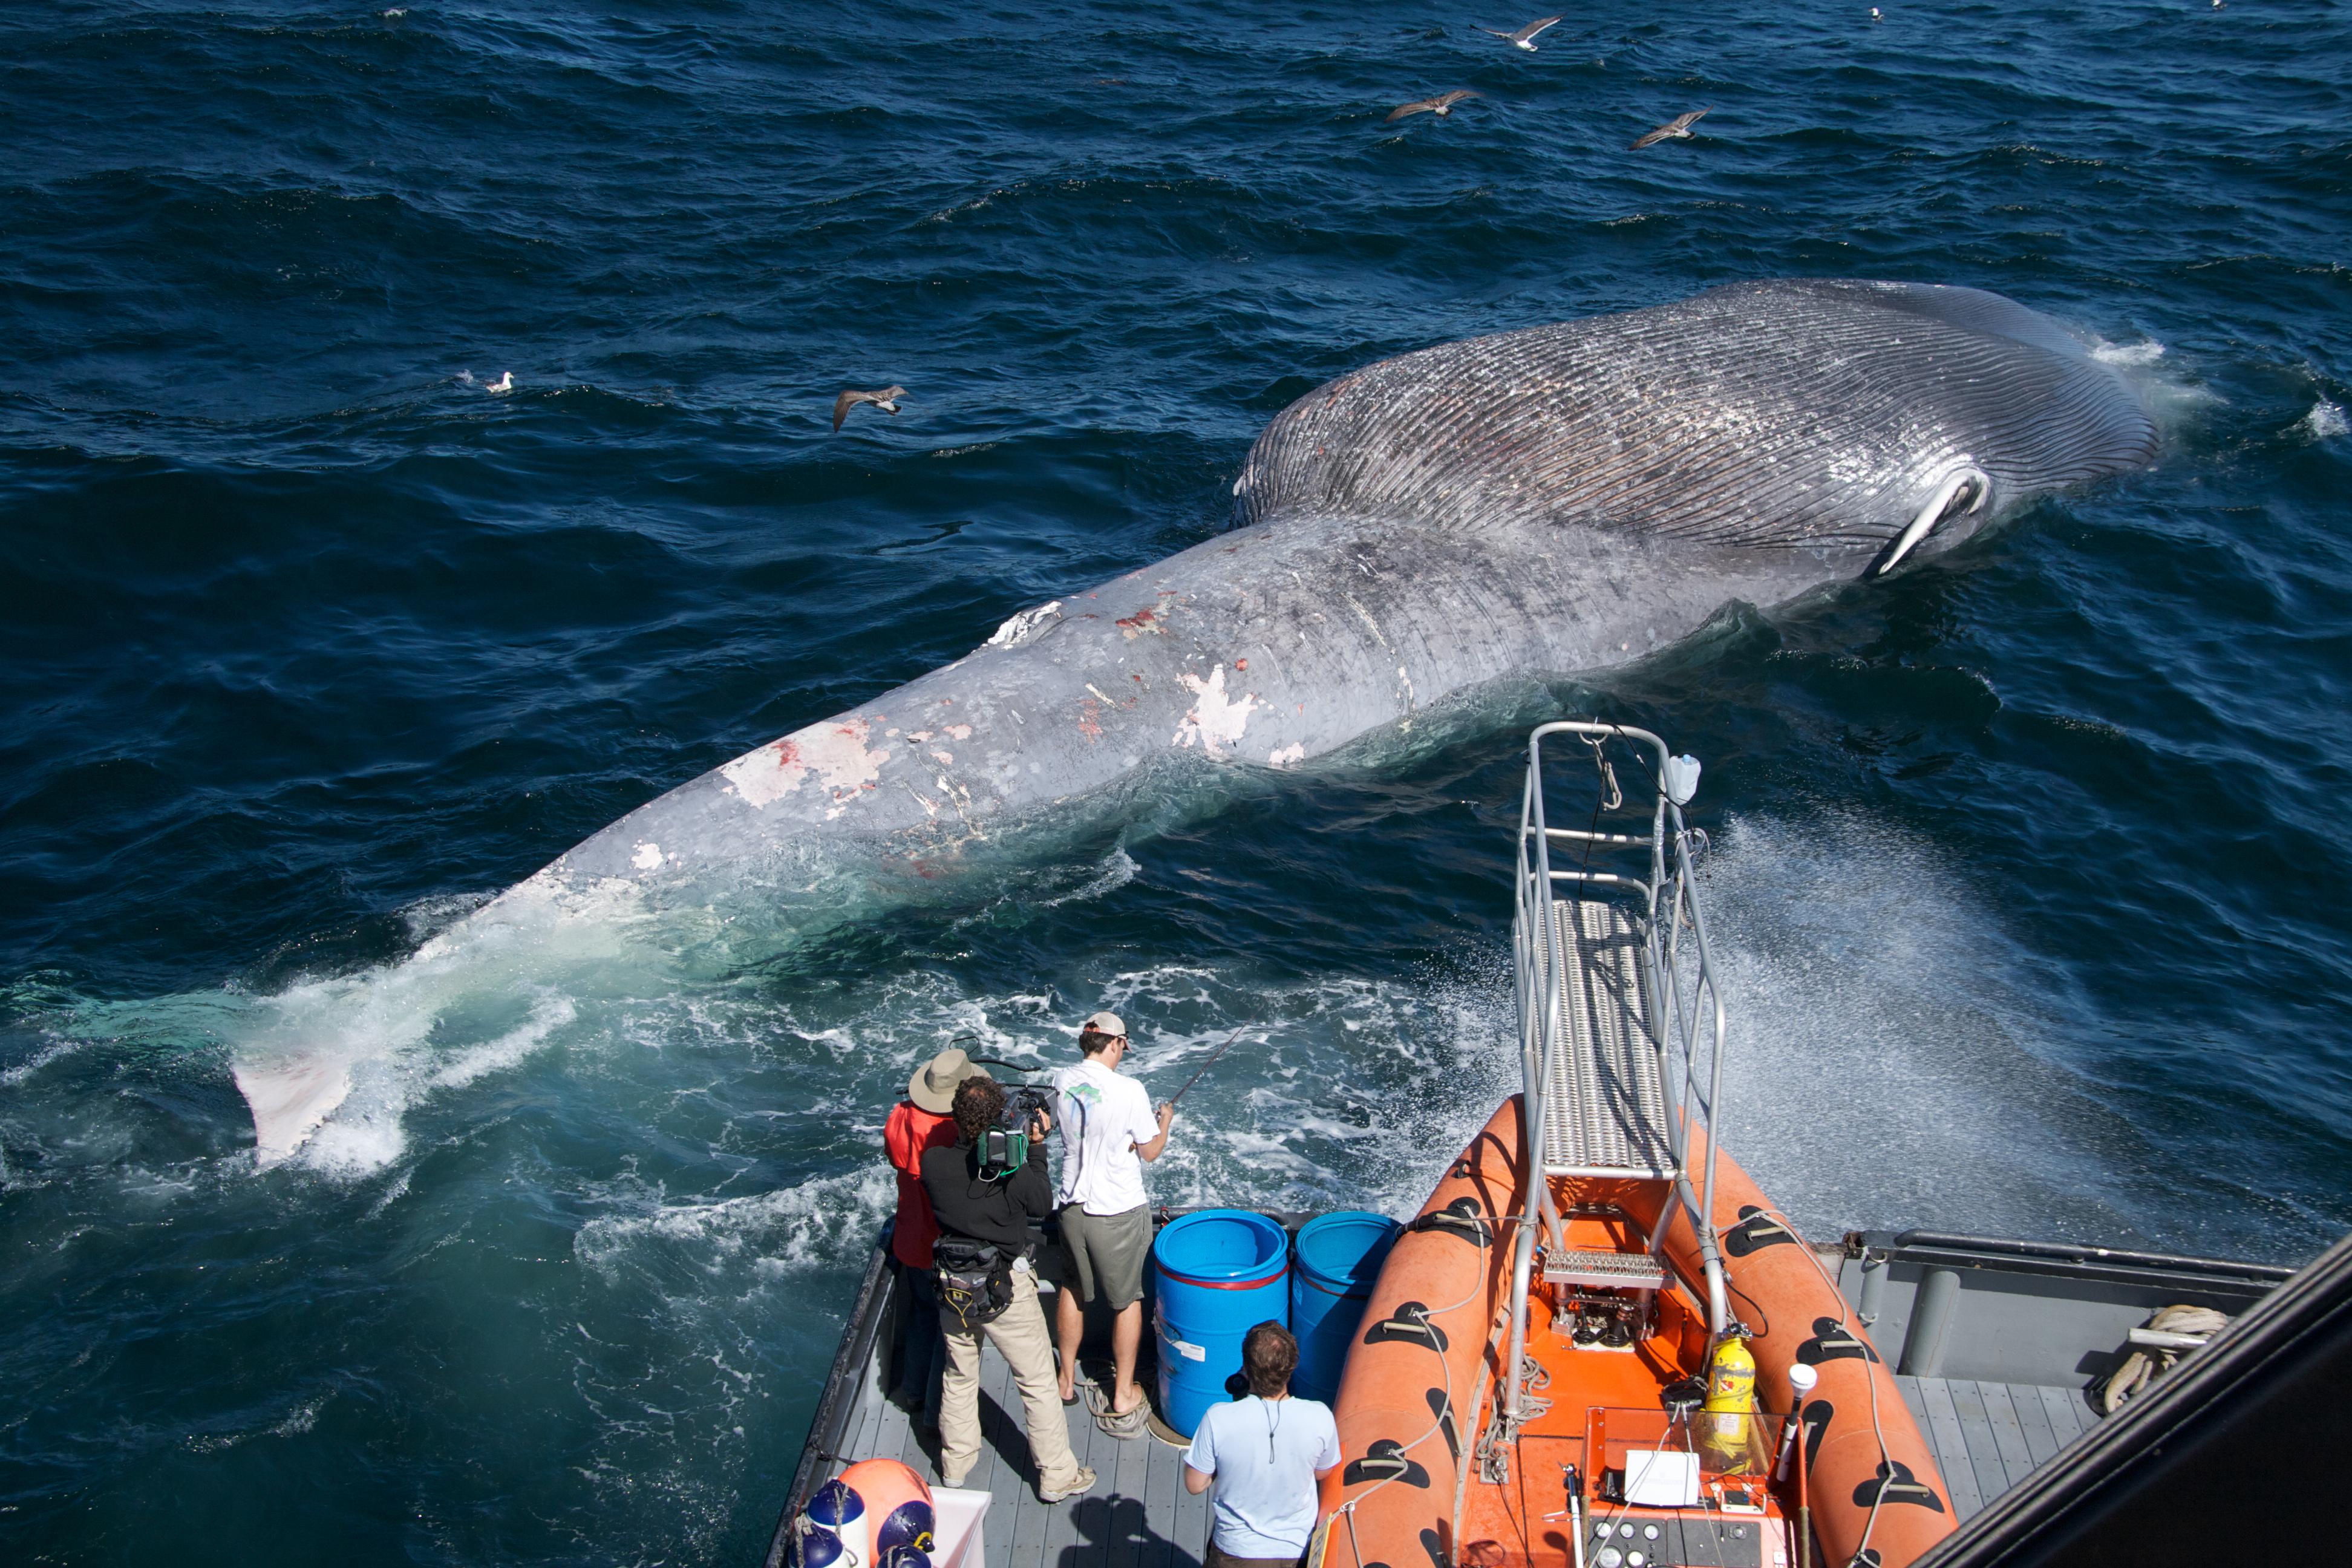 File:Blue whale ship strike death.jpg - Wikimedia Commons